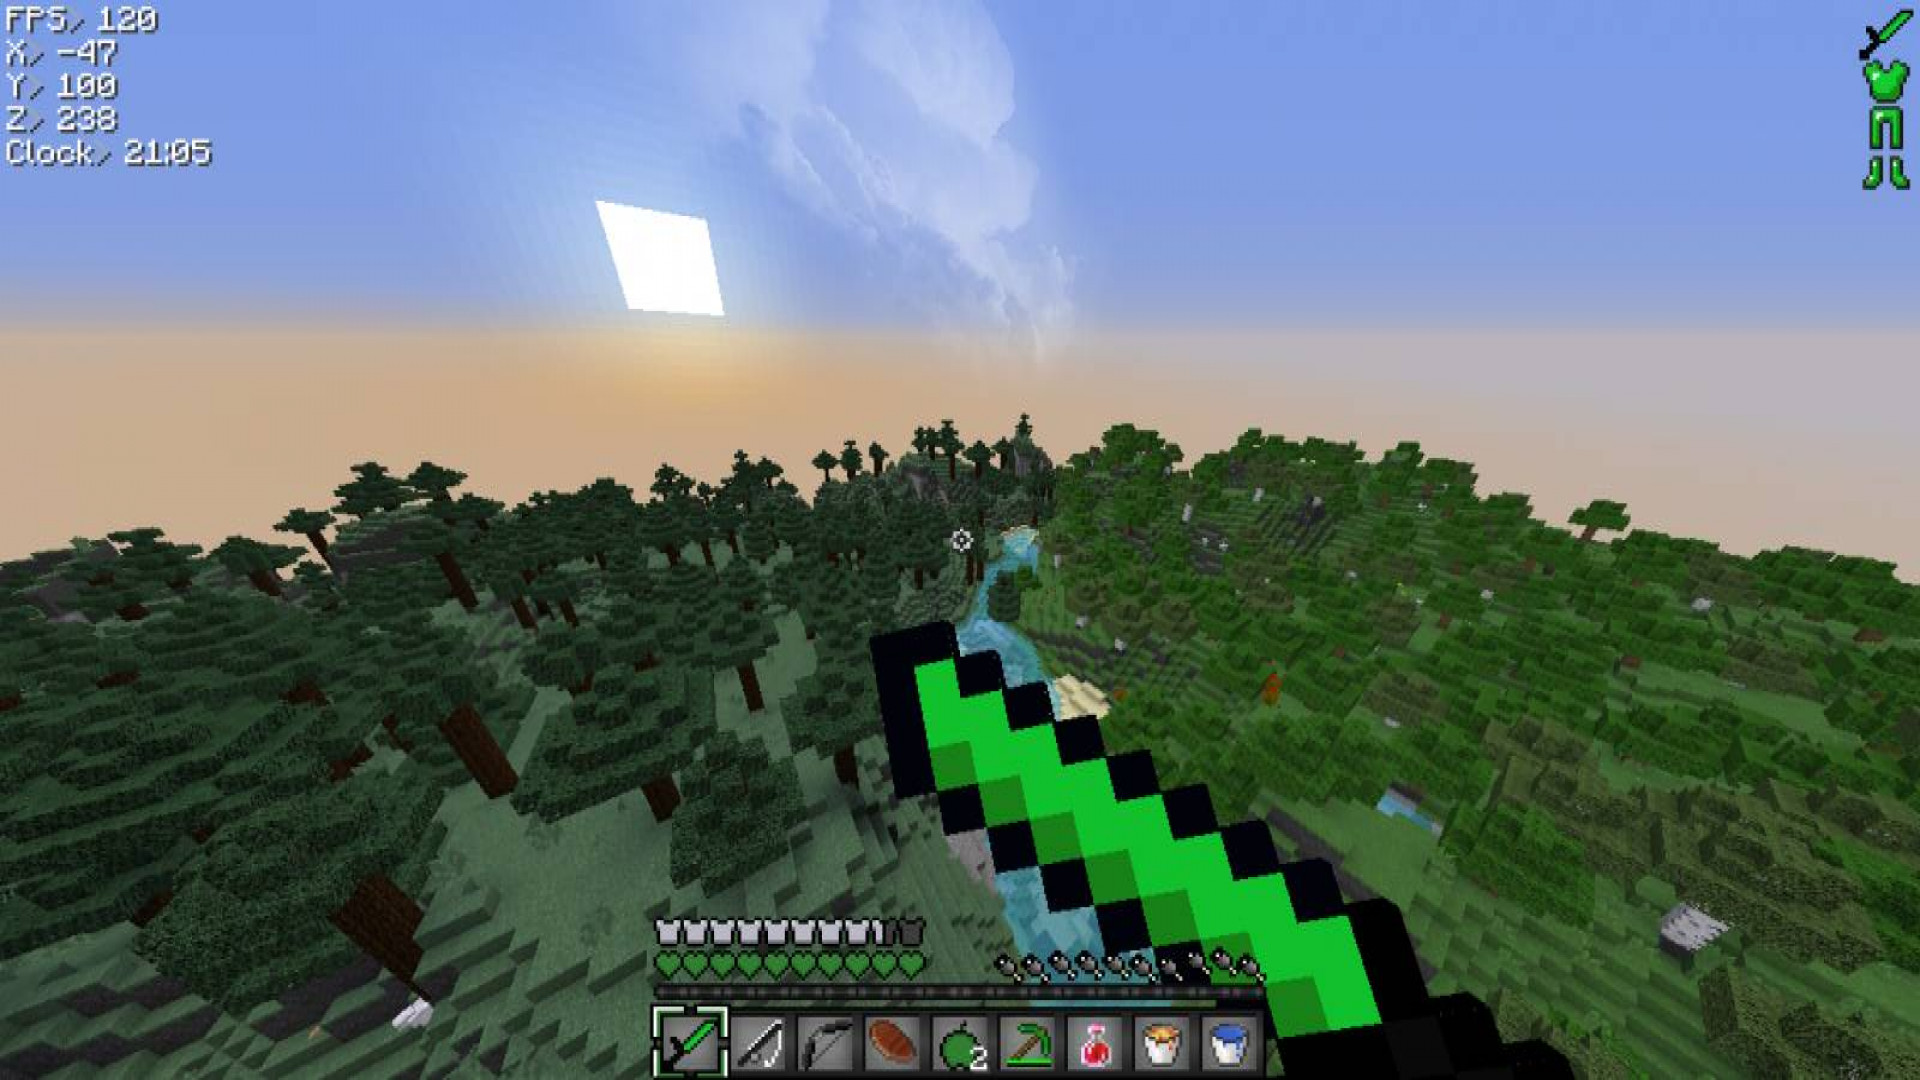 zickzack_v4 - green edit